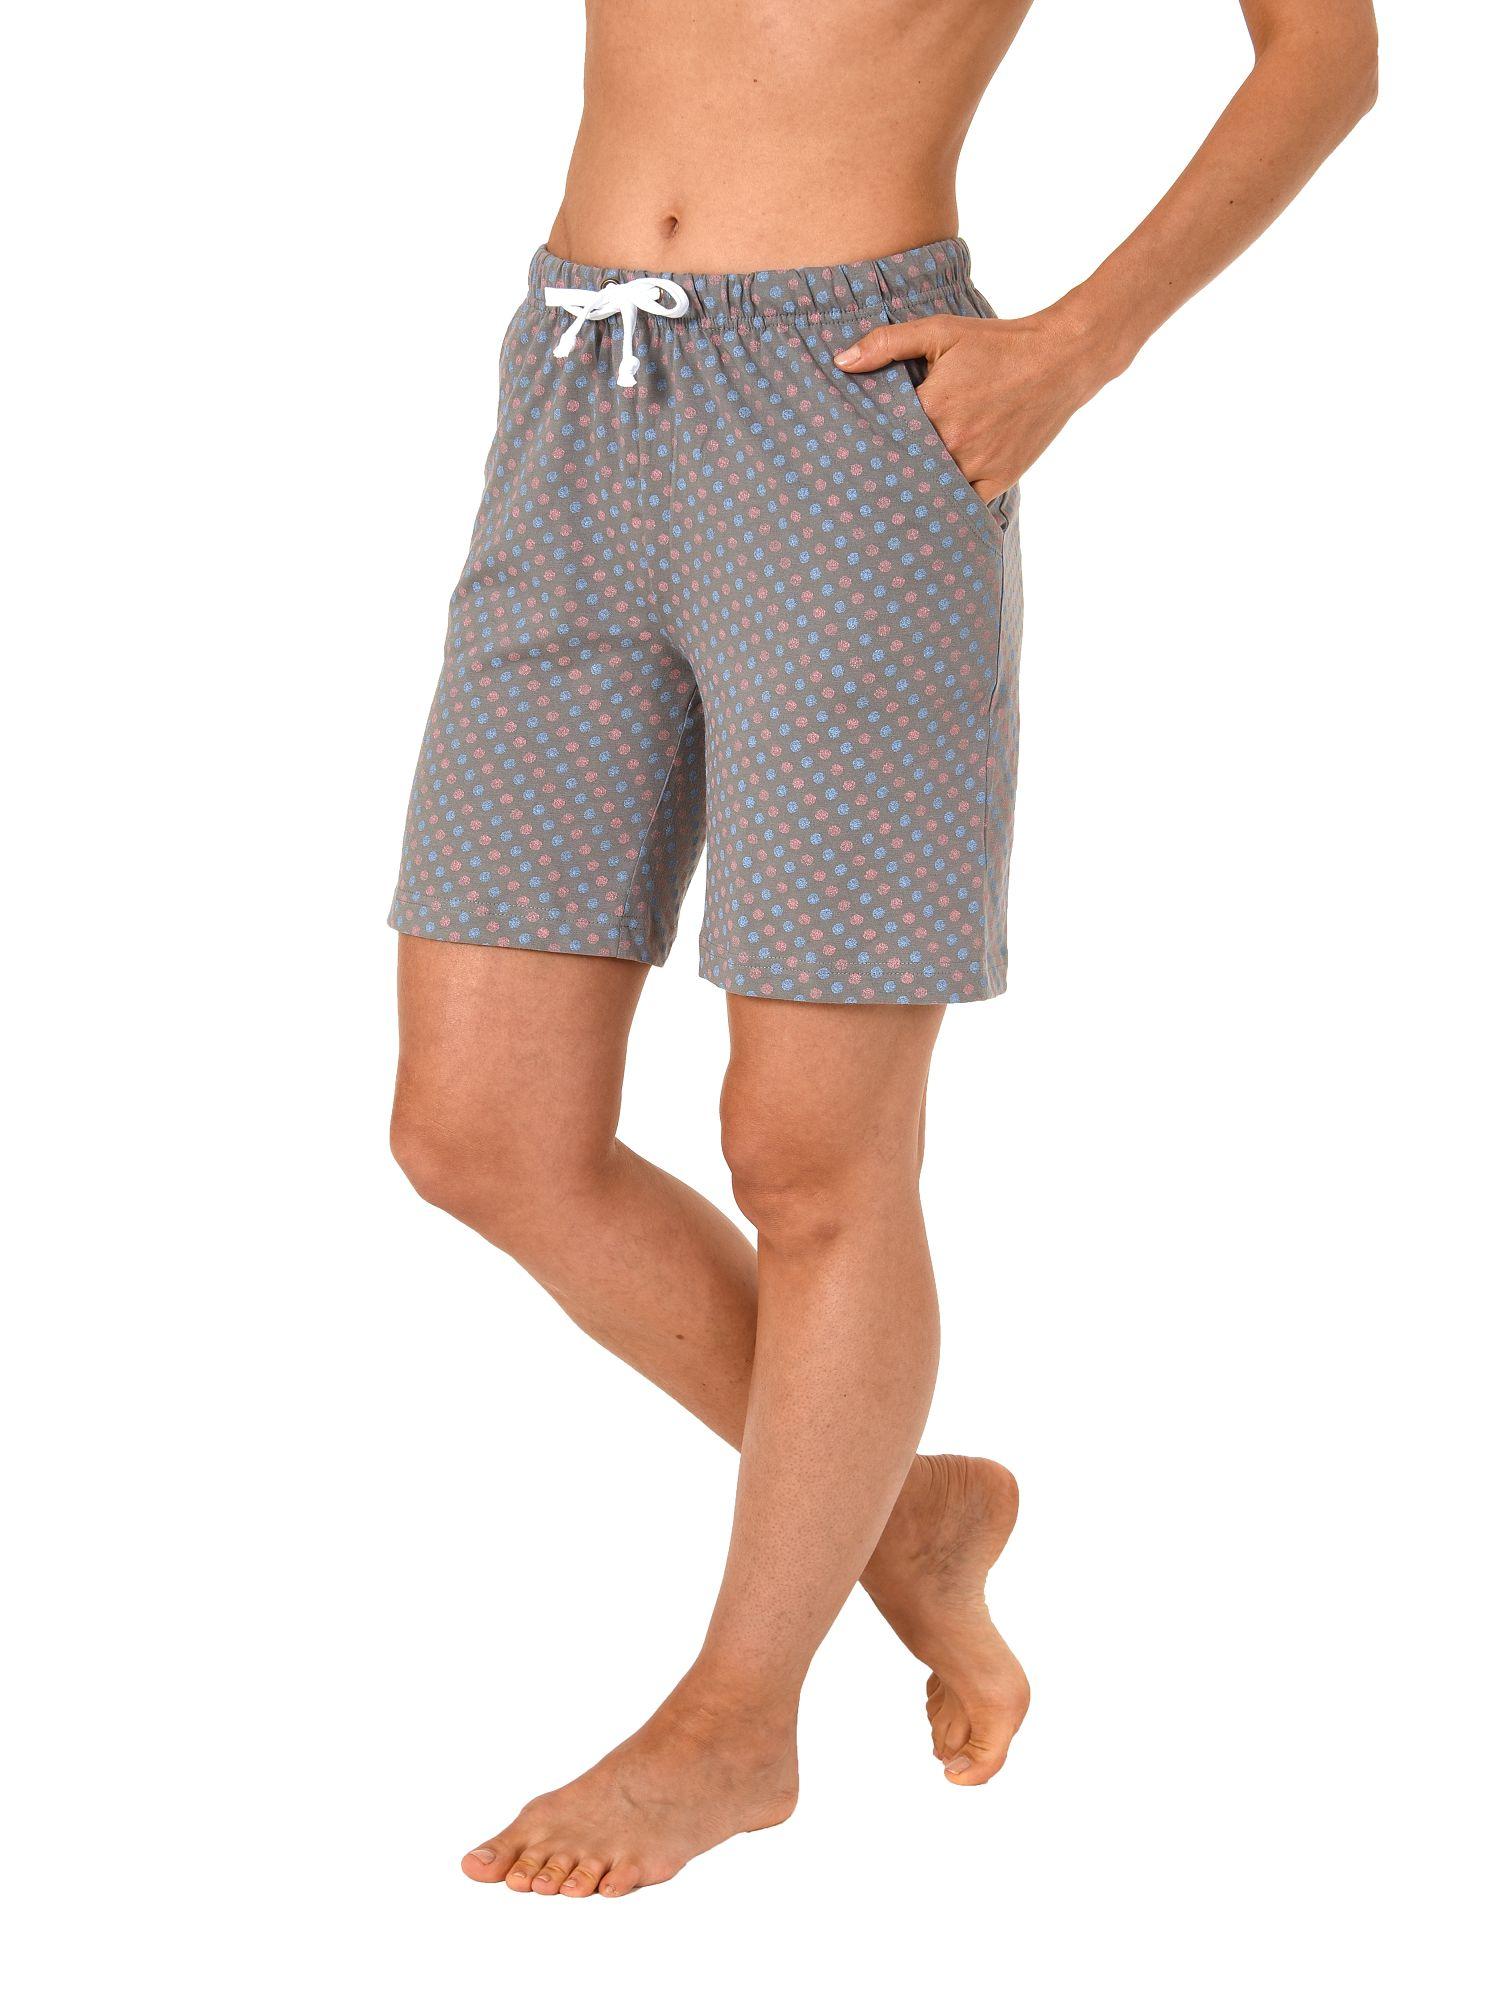 Damen Bermuda Pyjamahose kurz Tupfen Mix & Match ideal zum kombinieren 181 224 90 904